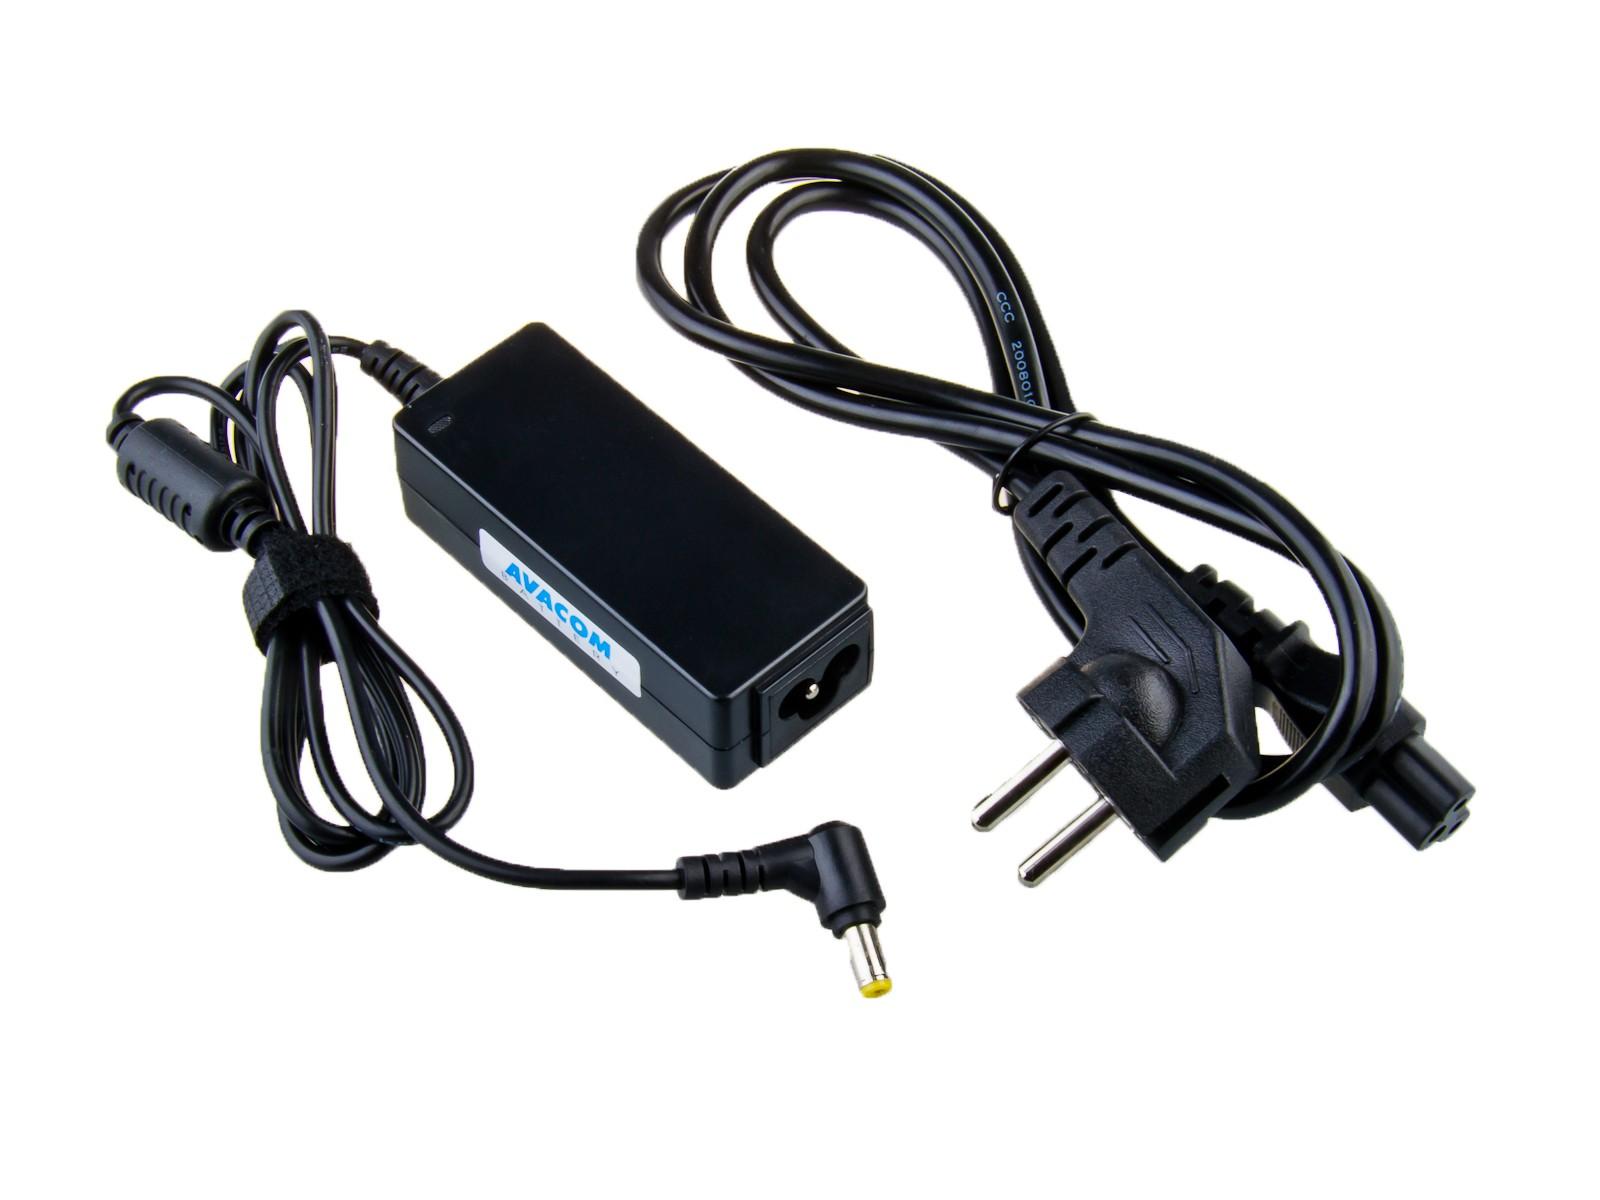 Nabíjecí adaptér AVACOM ADAC-ACER-30W pro netbook Acer, Dell 19V 1,58A 30W konektor 5,5mm x 1,7mm